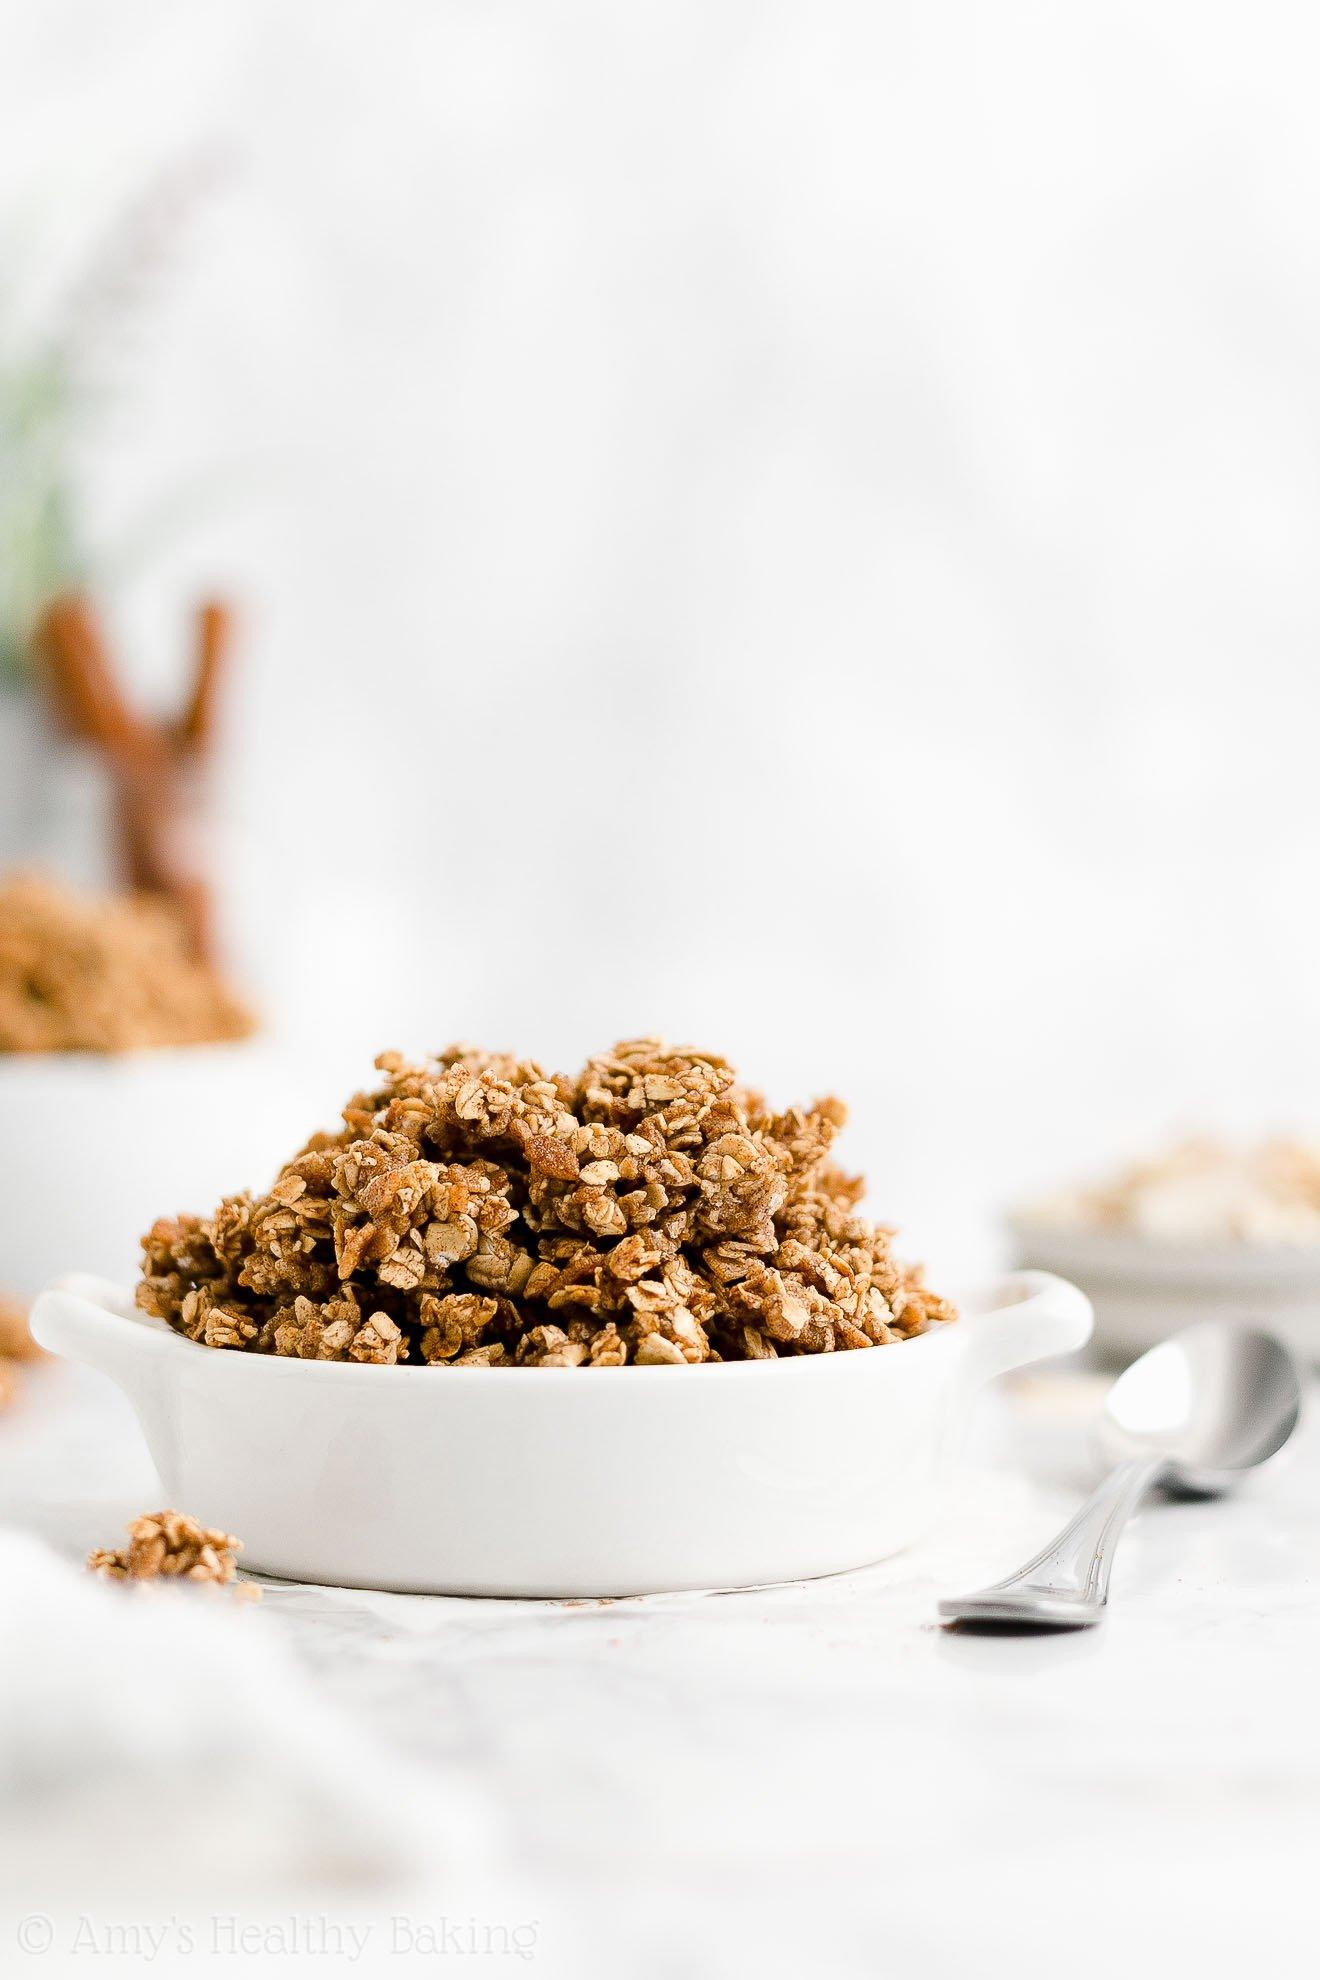 easy healthy clean eating whole grain low sugar oil free cinnamon granola